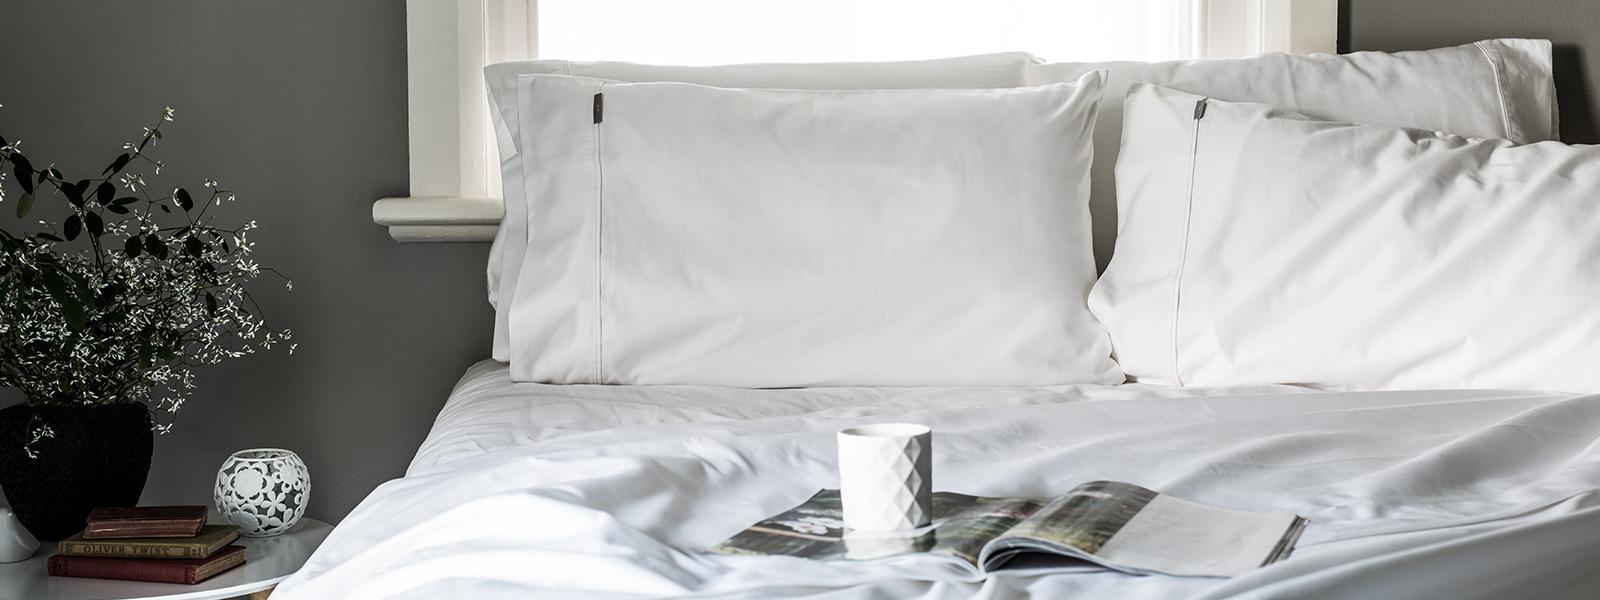 Canningvale Premium Bathroom Textiles Luxury Bedding